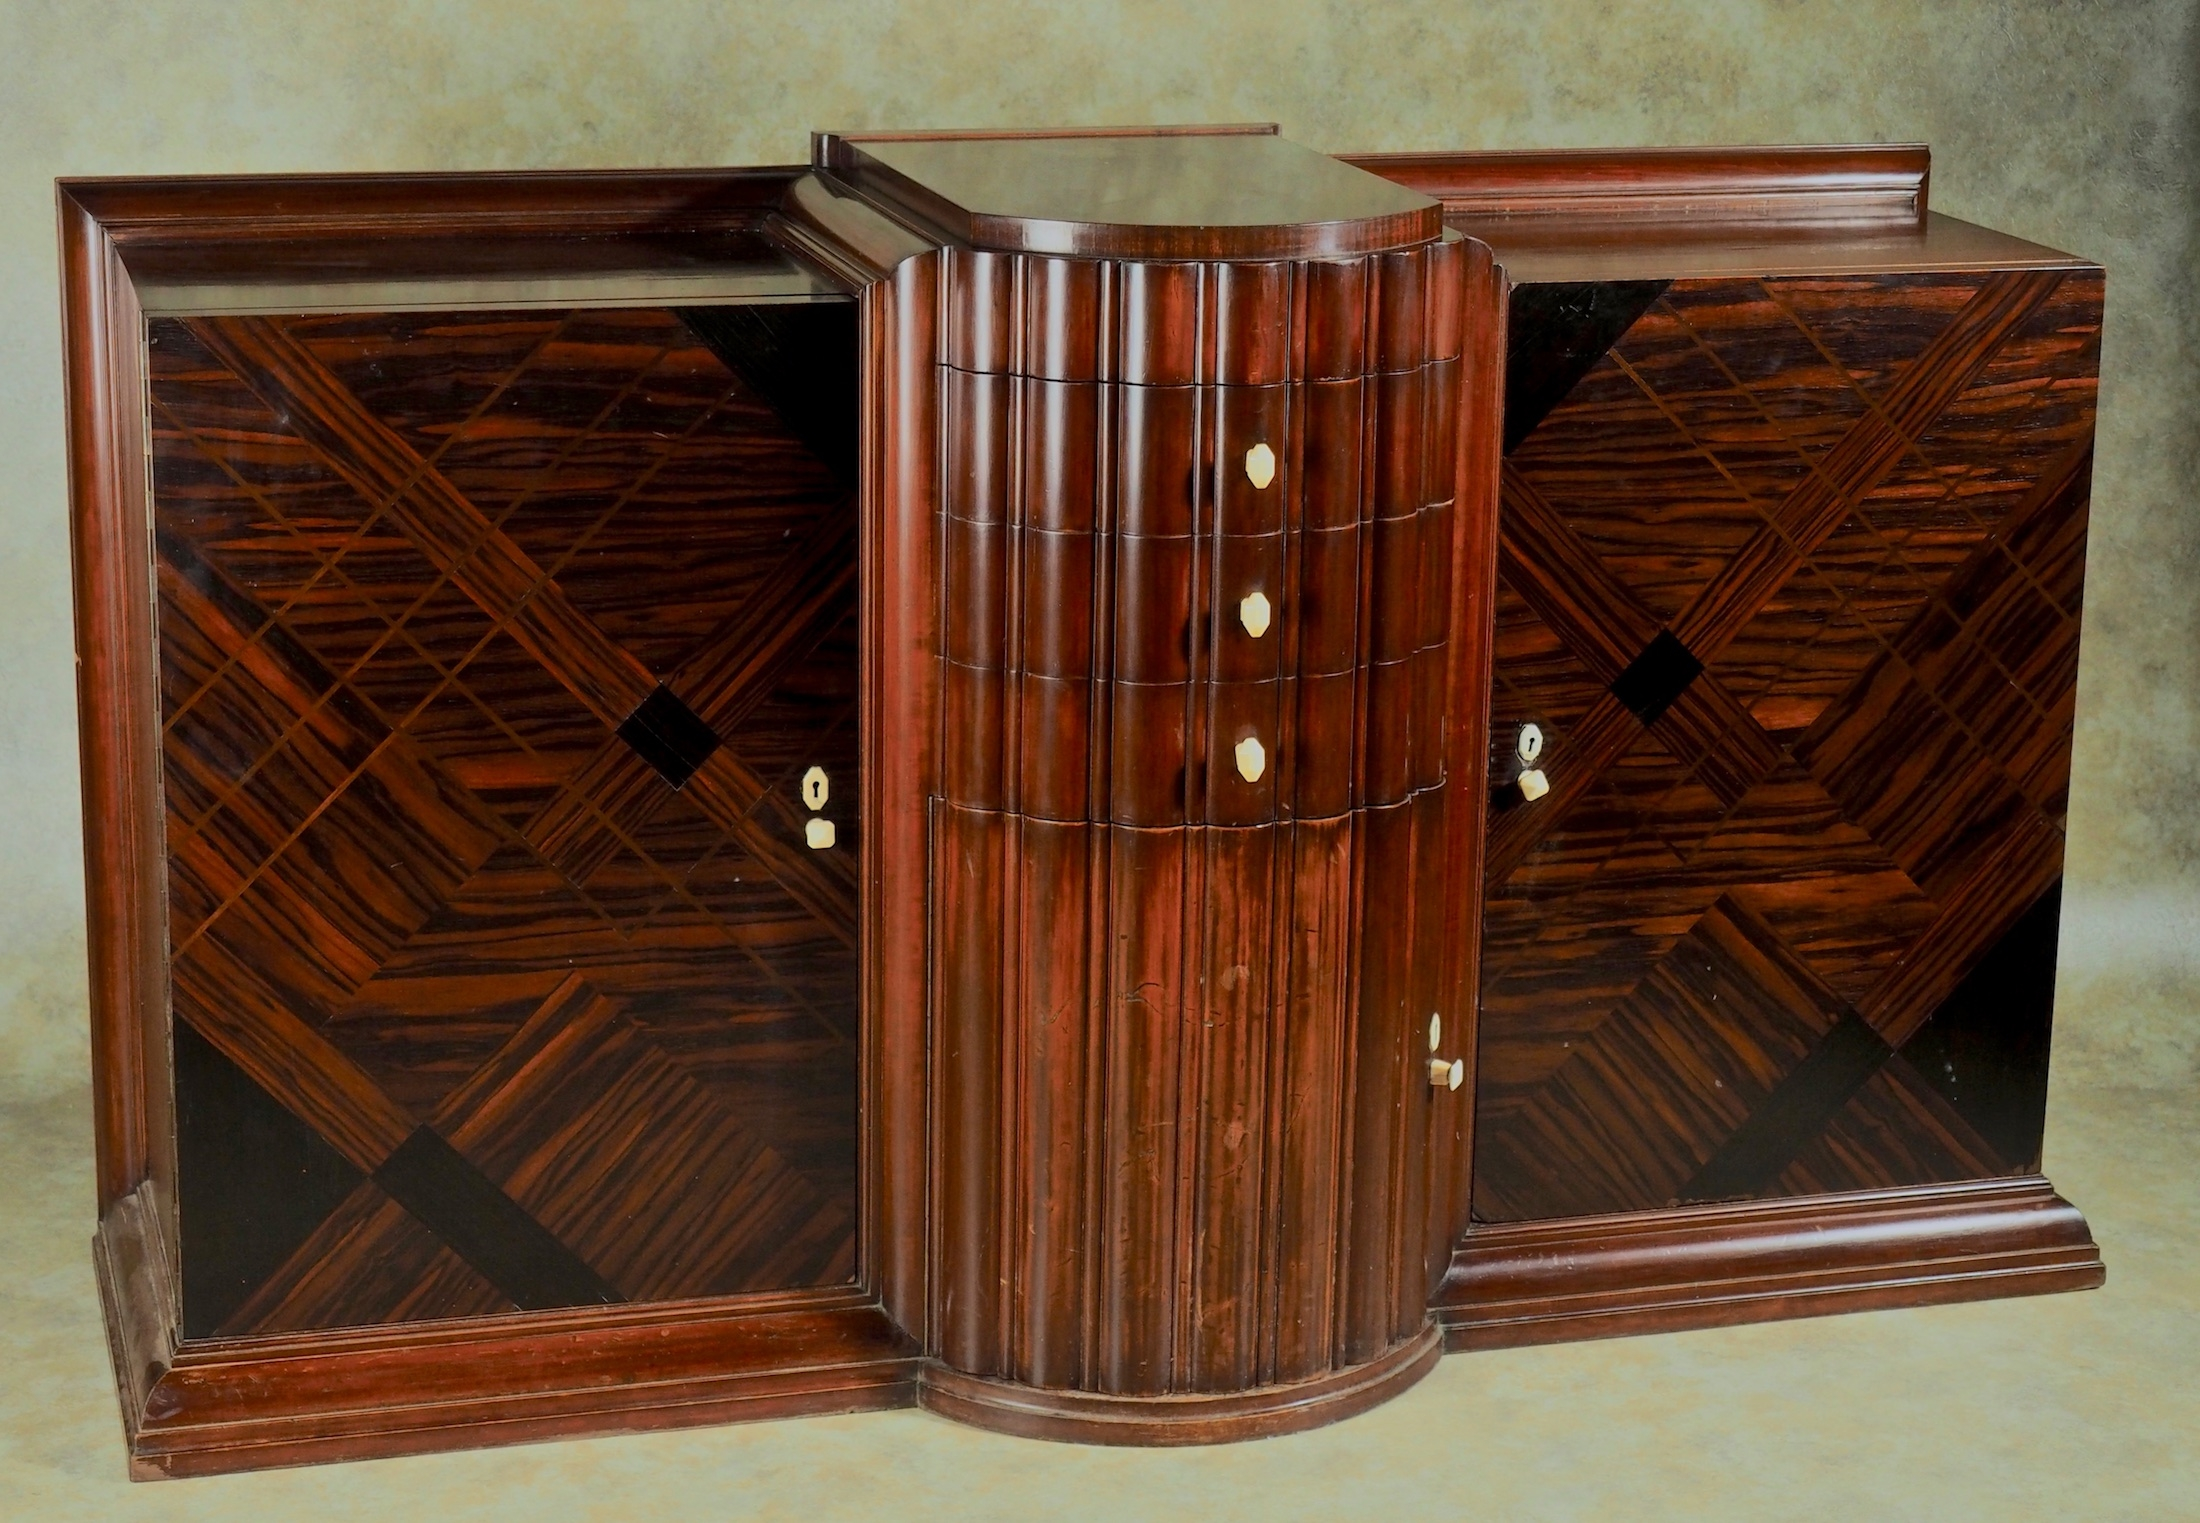 Joubert+et+Petit+1926+Modernist+cabinet+747.jpg